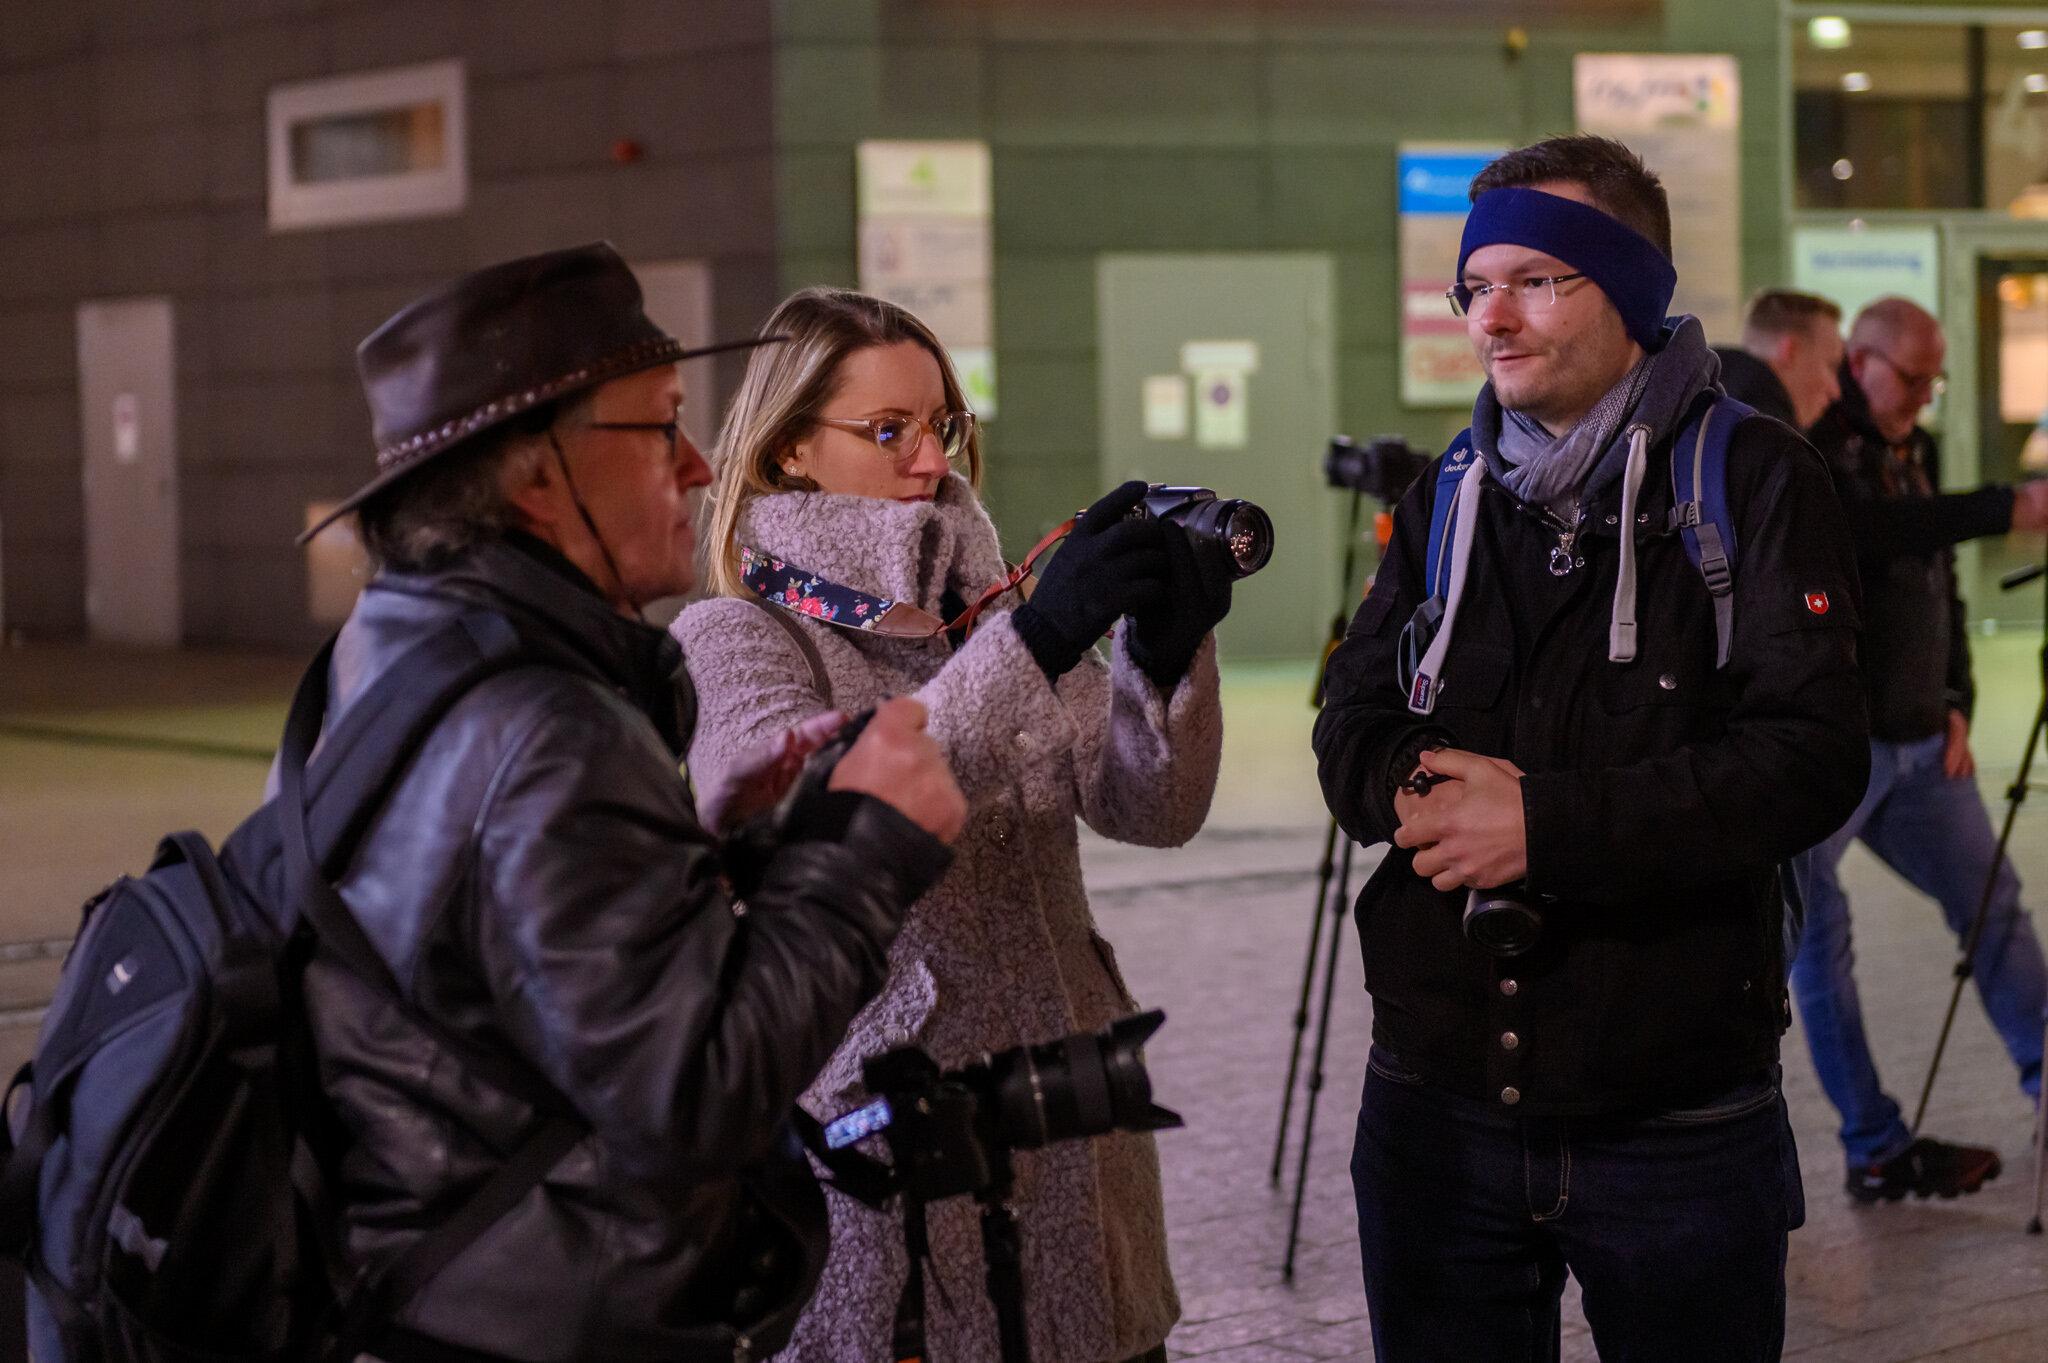 30. Photowalk Mediapark Hansaring